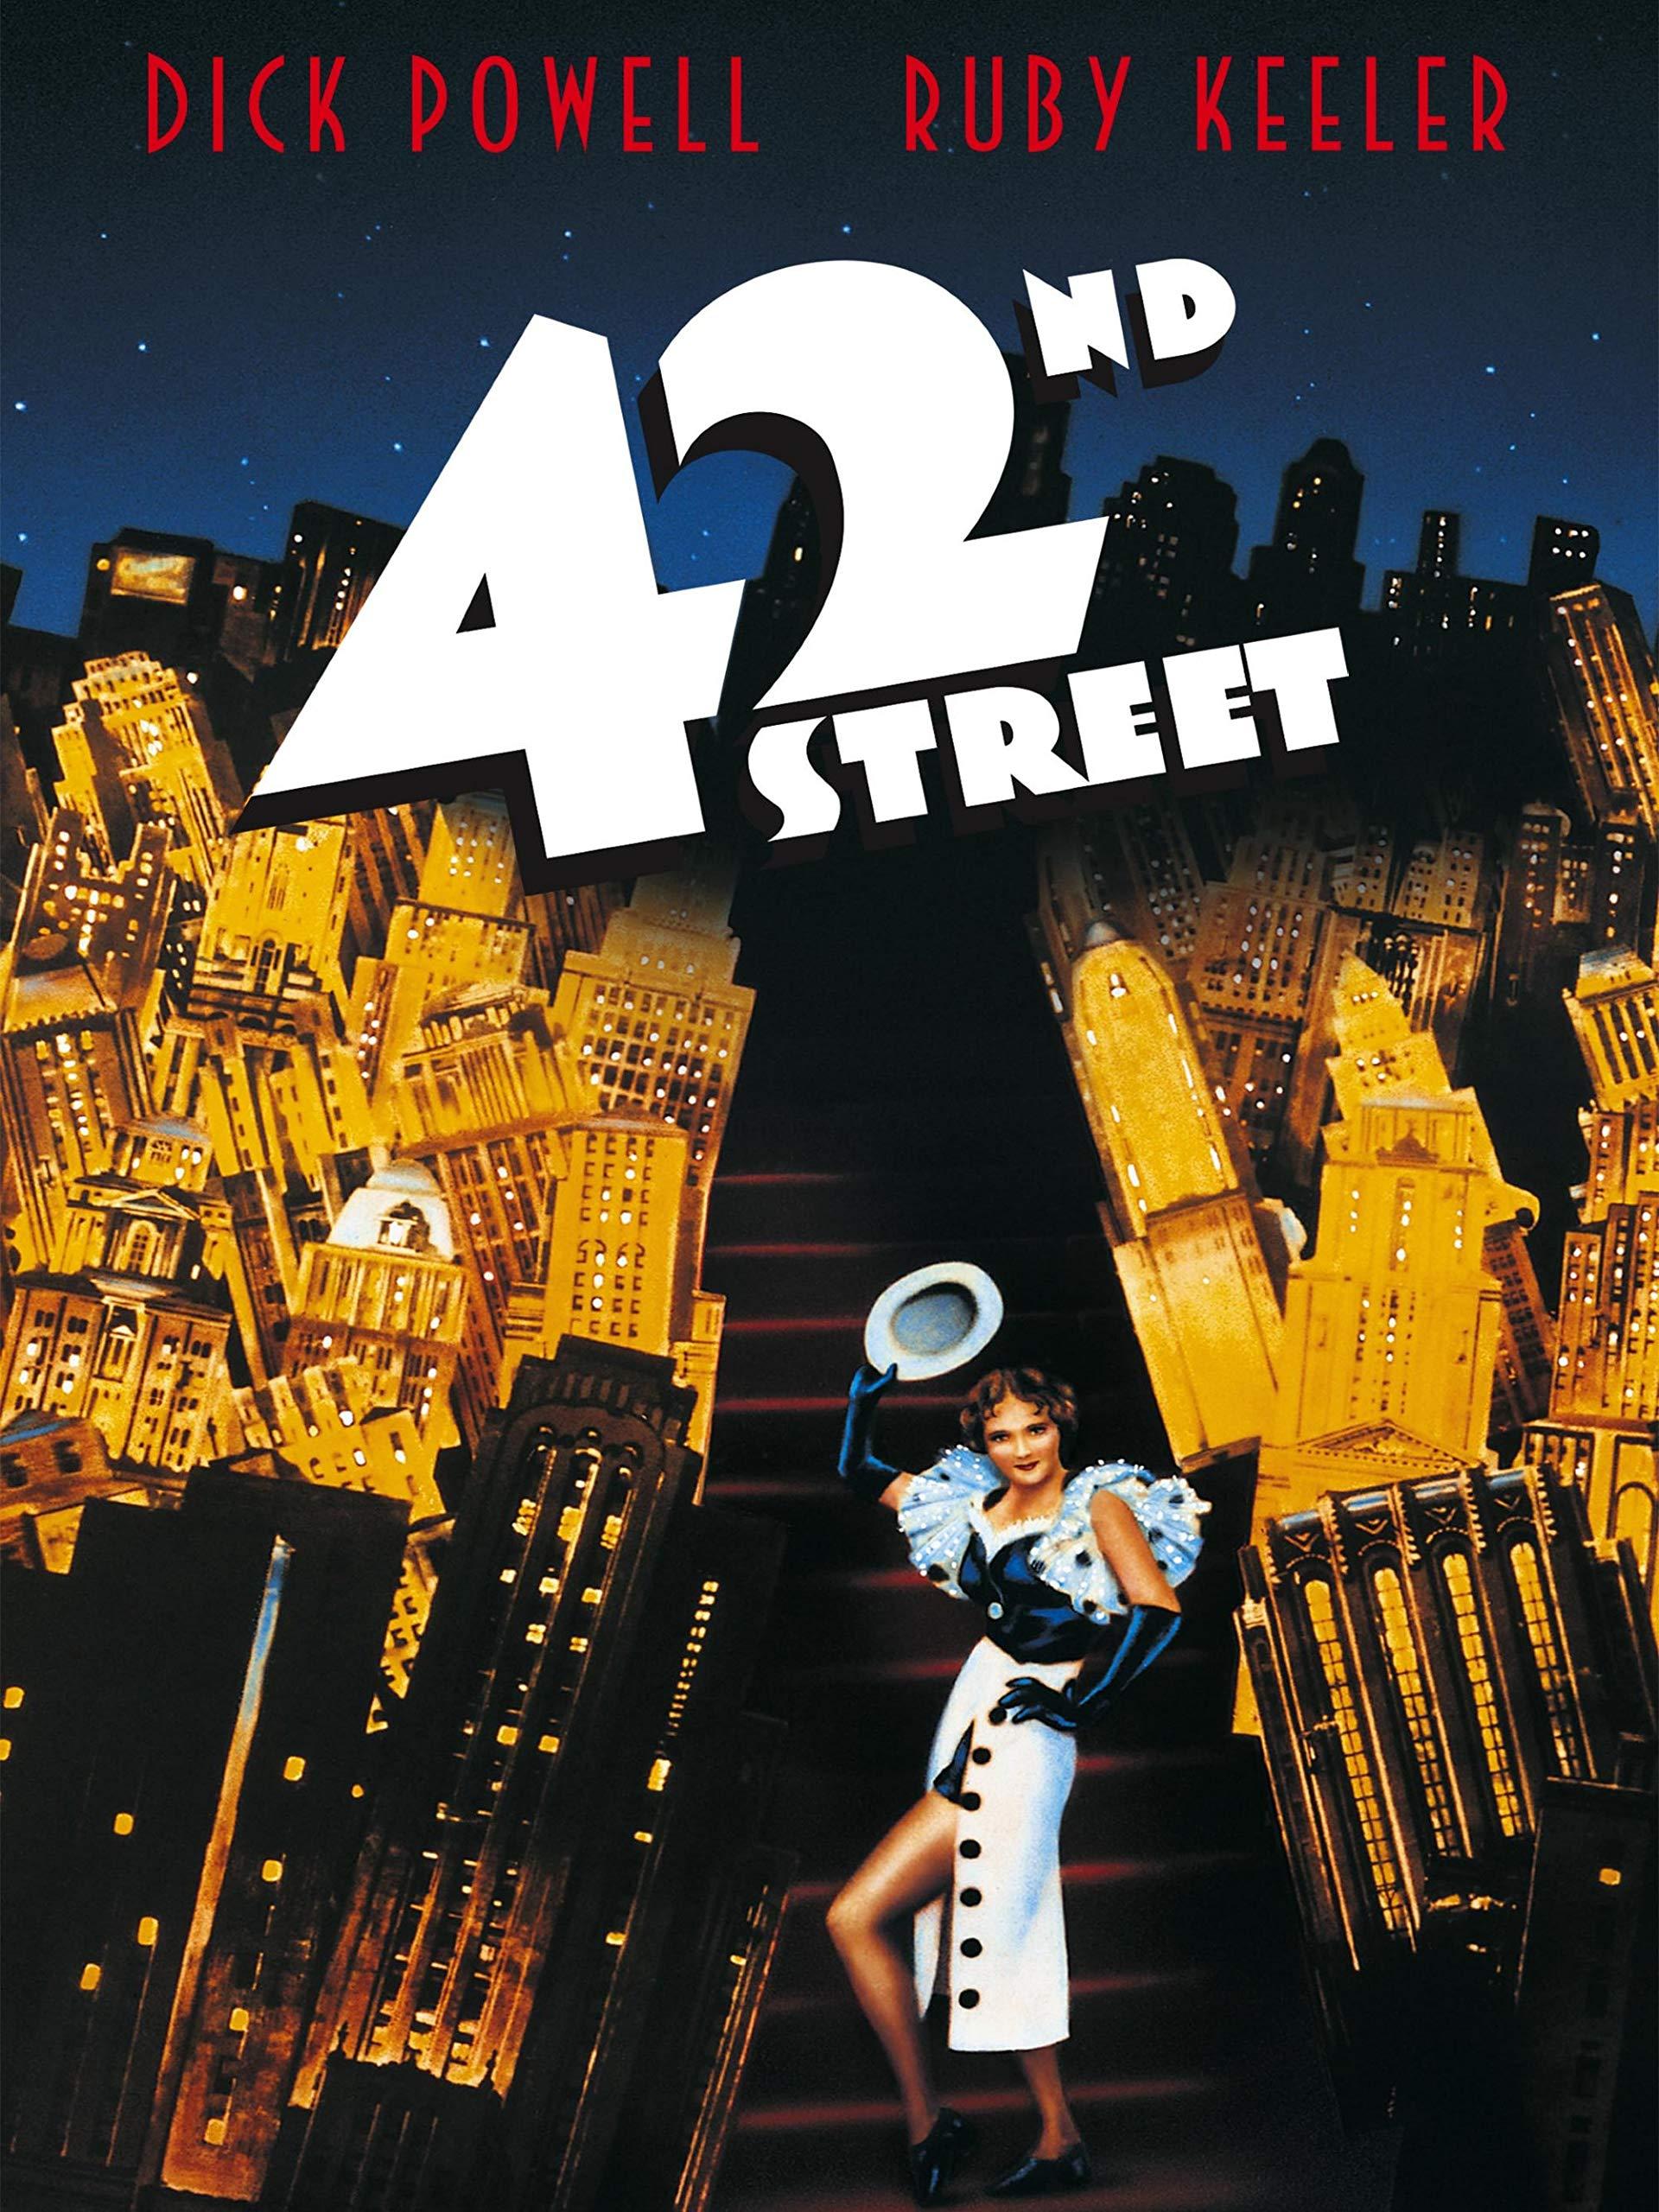 42nd Street (1933) starring Ruby Keeler, Dick Powell, Warner Baxter